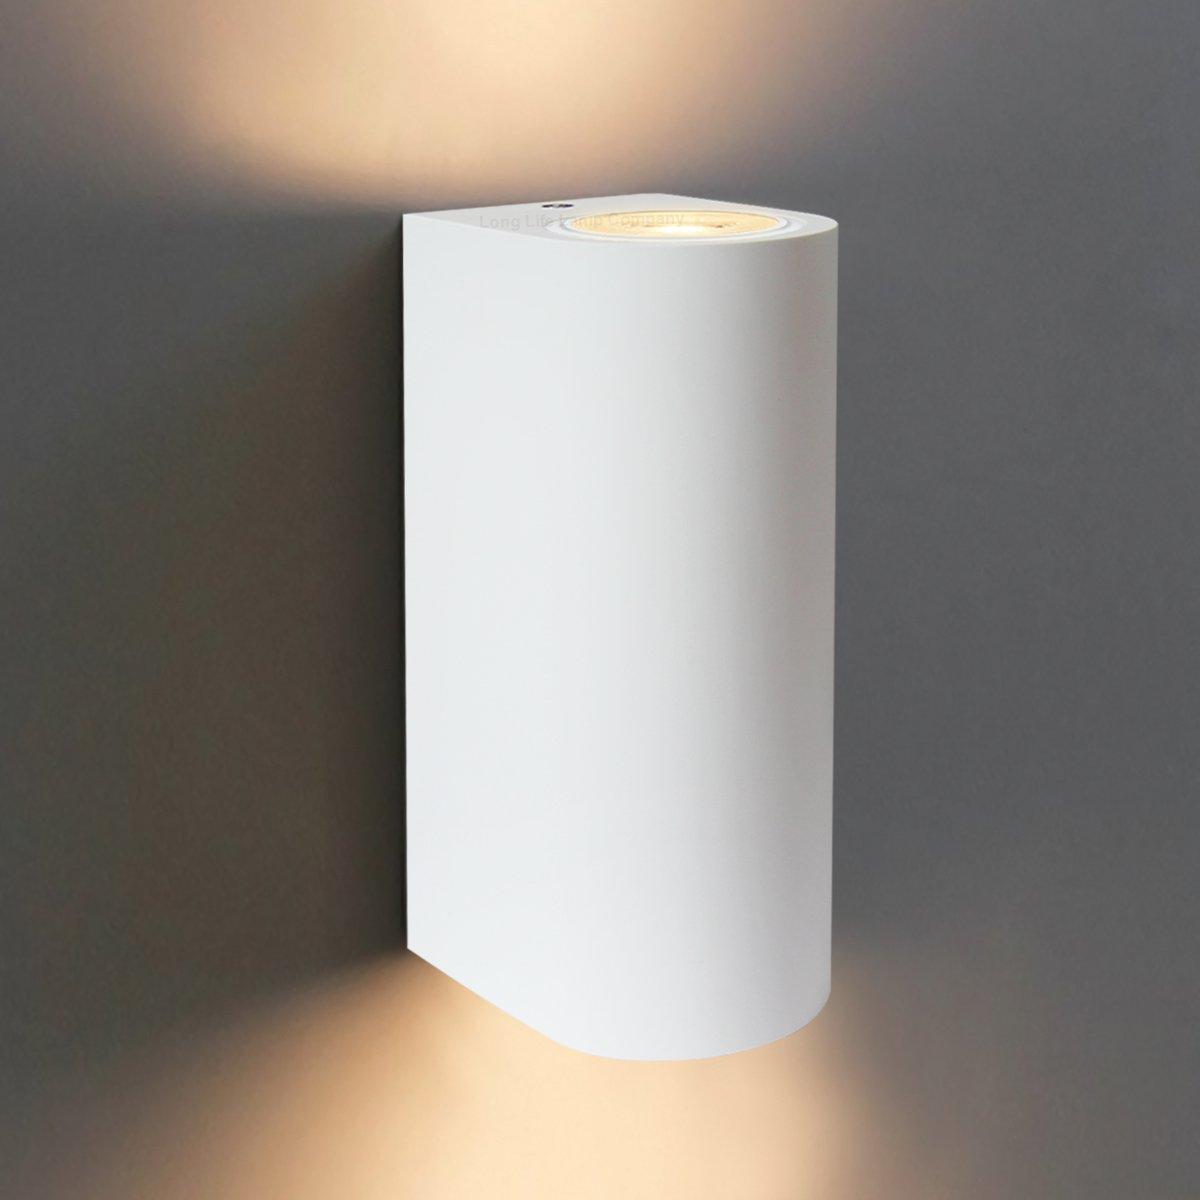 Modern Up Down Indoor White Ceramic Wall Light Fixture GU25 B825